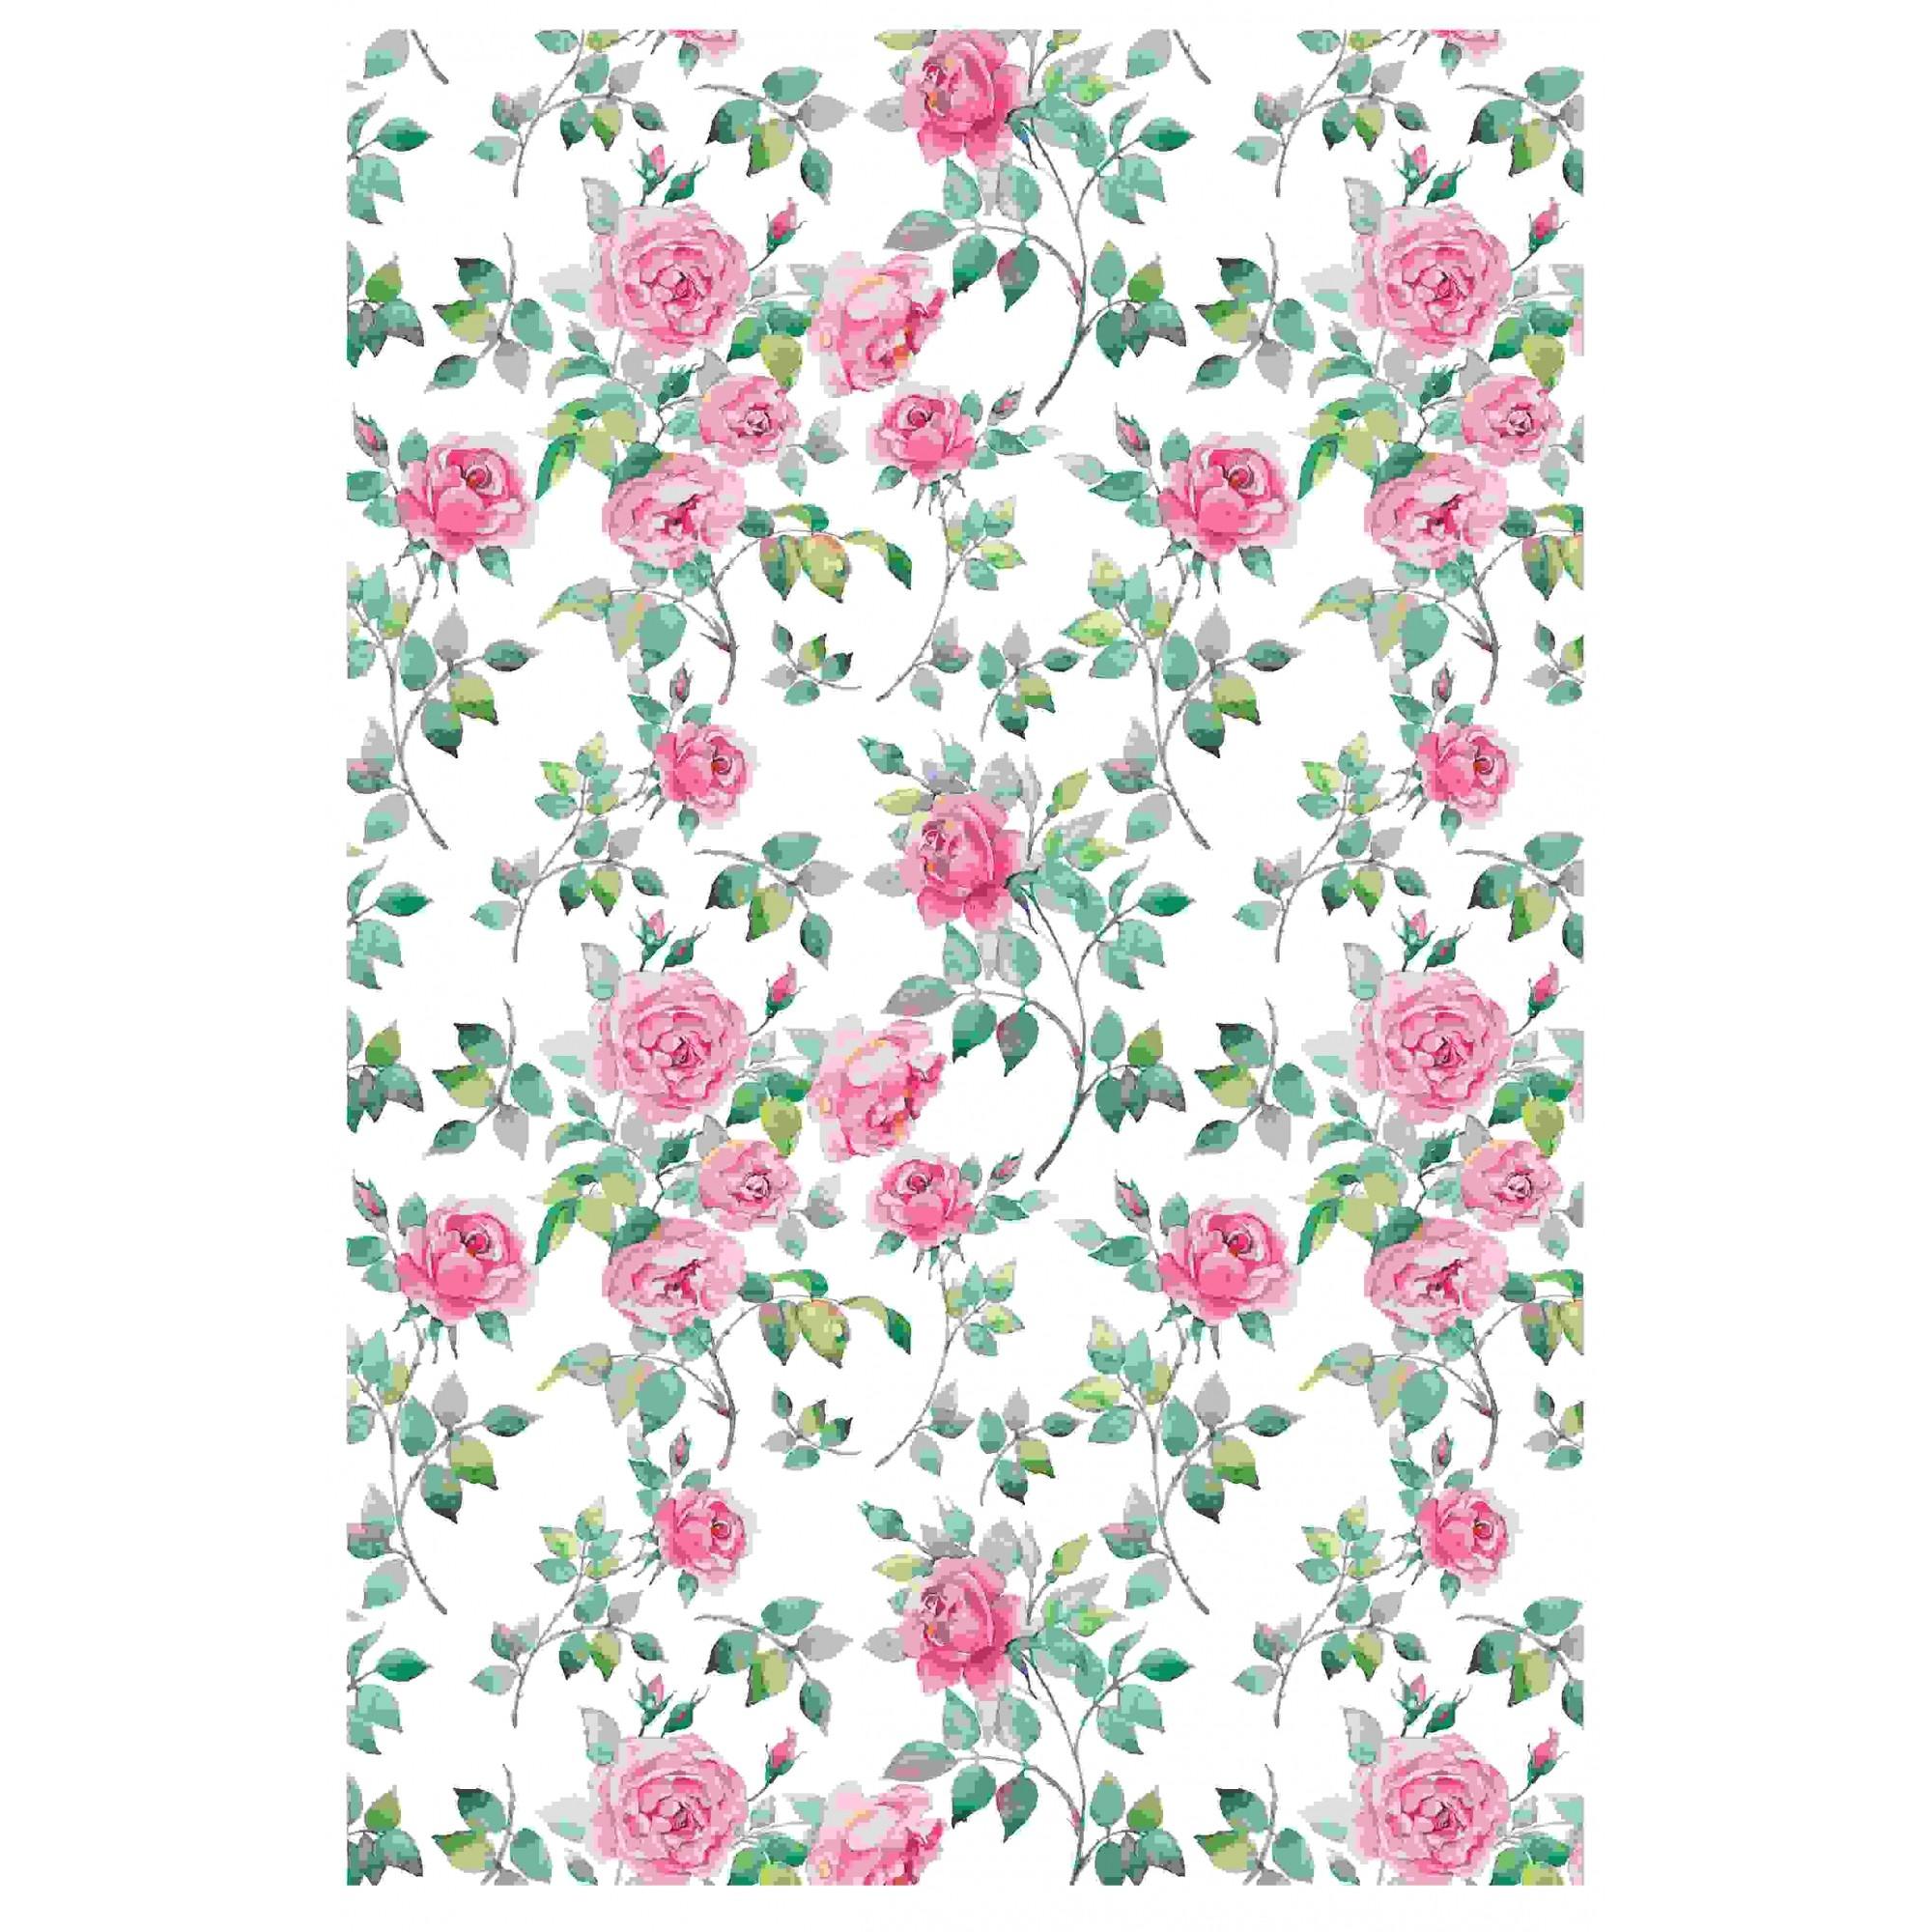 Decalque para Porcelana - Rosas Inglesas OUTRA TONALIDADE